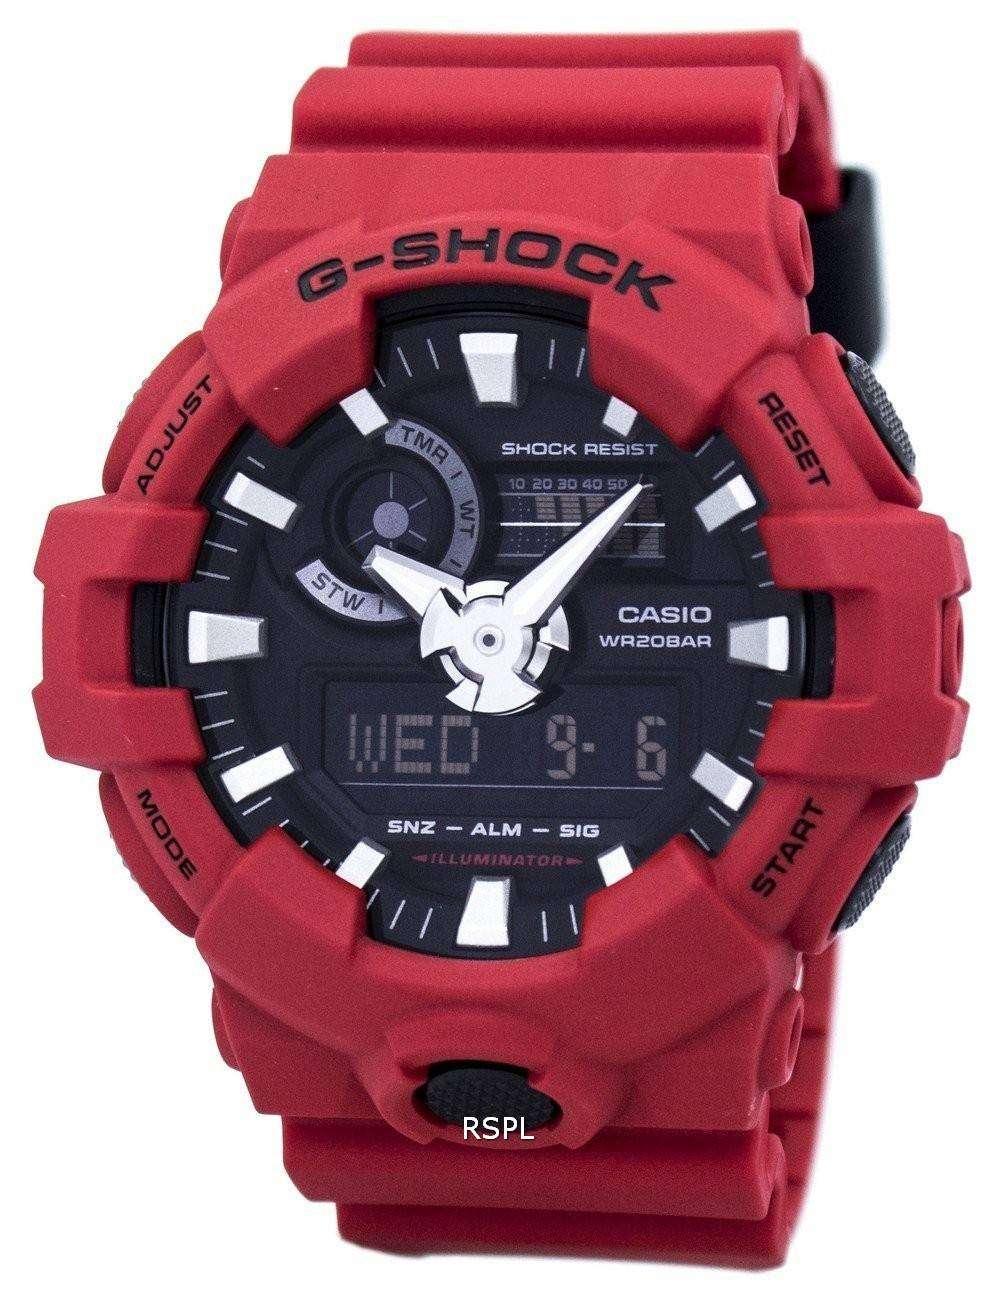 casio g shock analog digital 200m ga 700 4a men 39 s watch downunderwatches. Black Bedroom Furniture Sets. Home Design Ideas